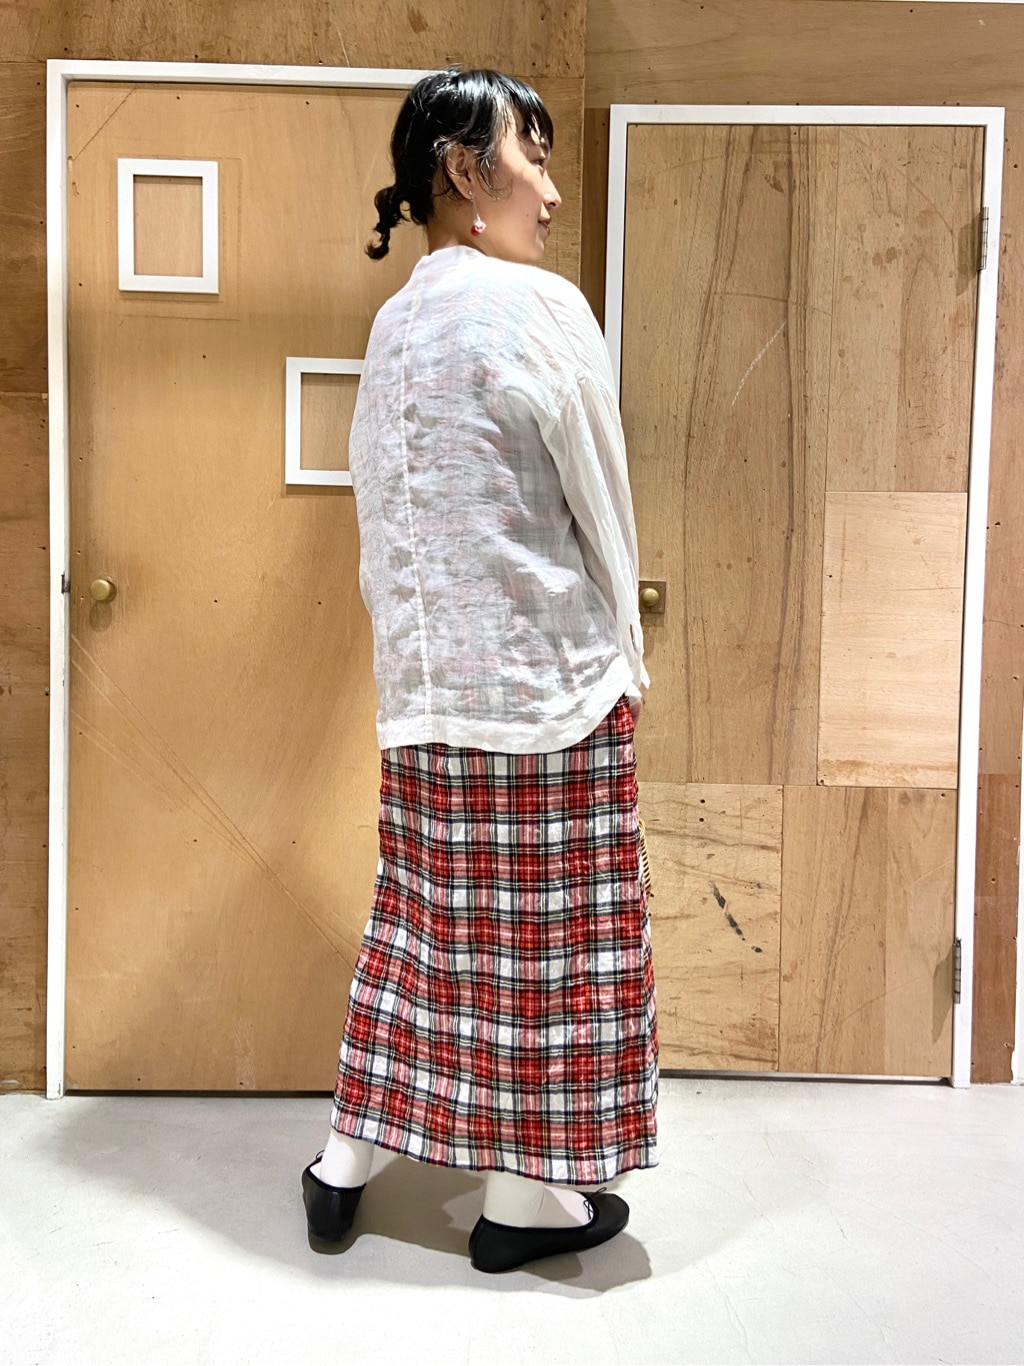 bulle de savon 新宿ミロード 身長:159cm 2020.08.26